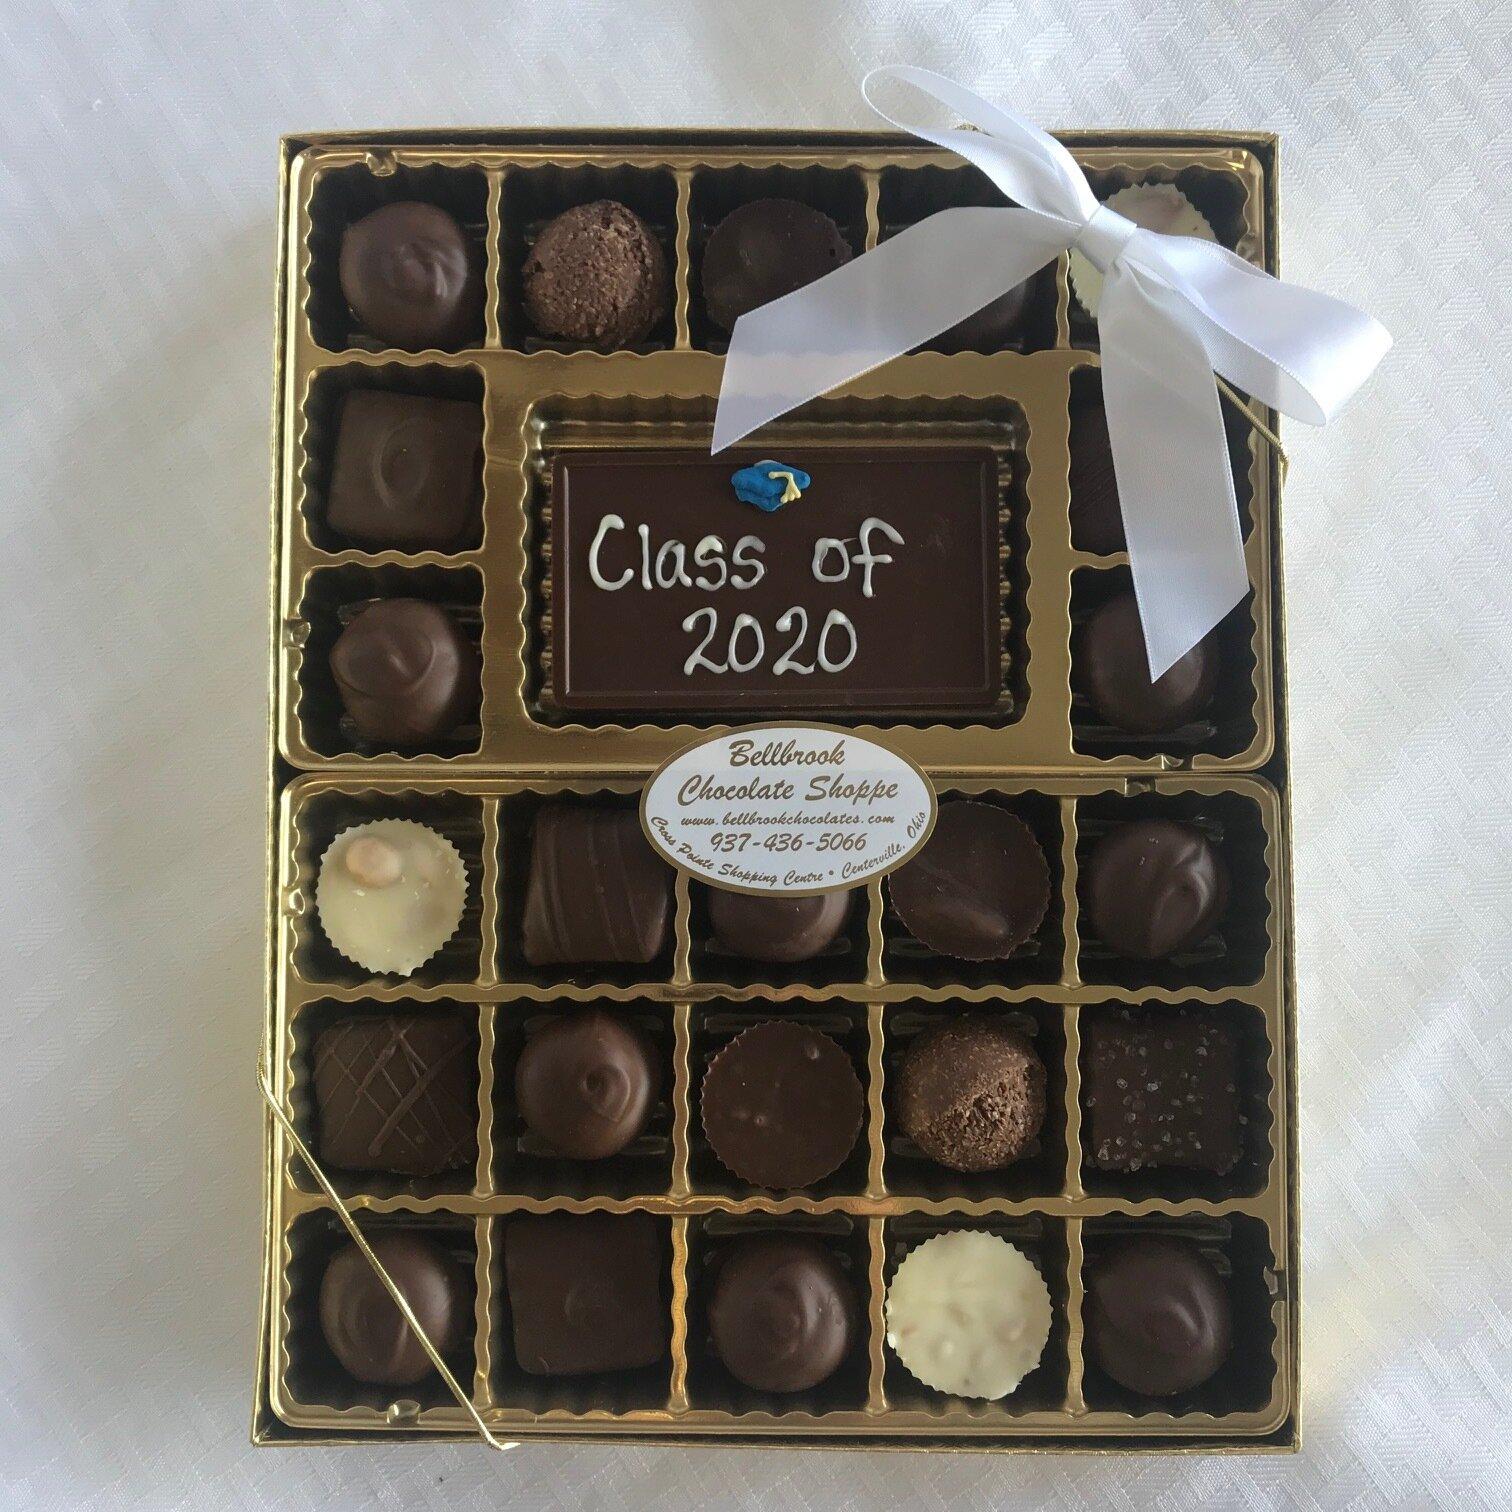 Bellbrook Halloween 2020 Graduation 2020 Boxed Chocolates — Bellbrook Chocolate Shoppe